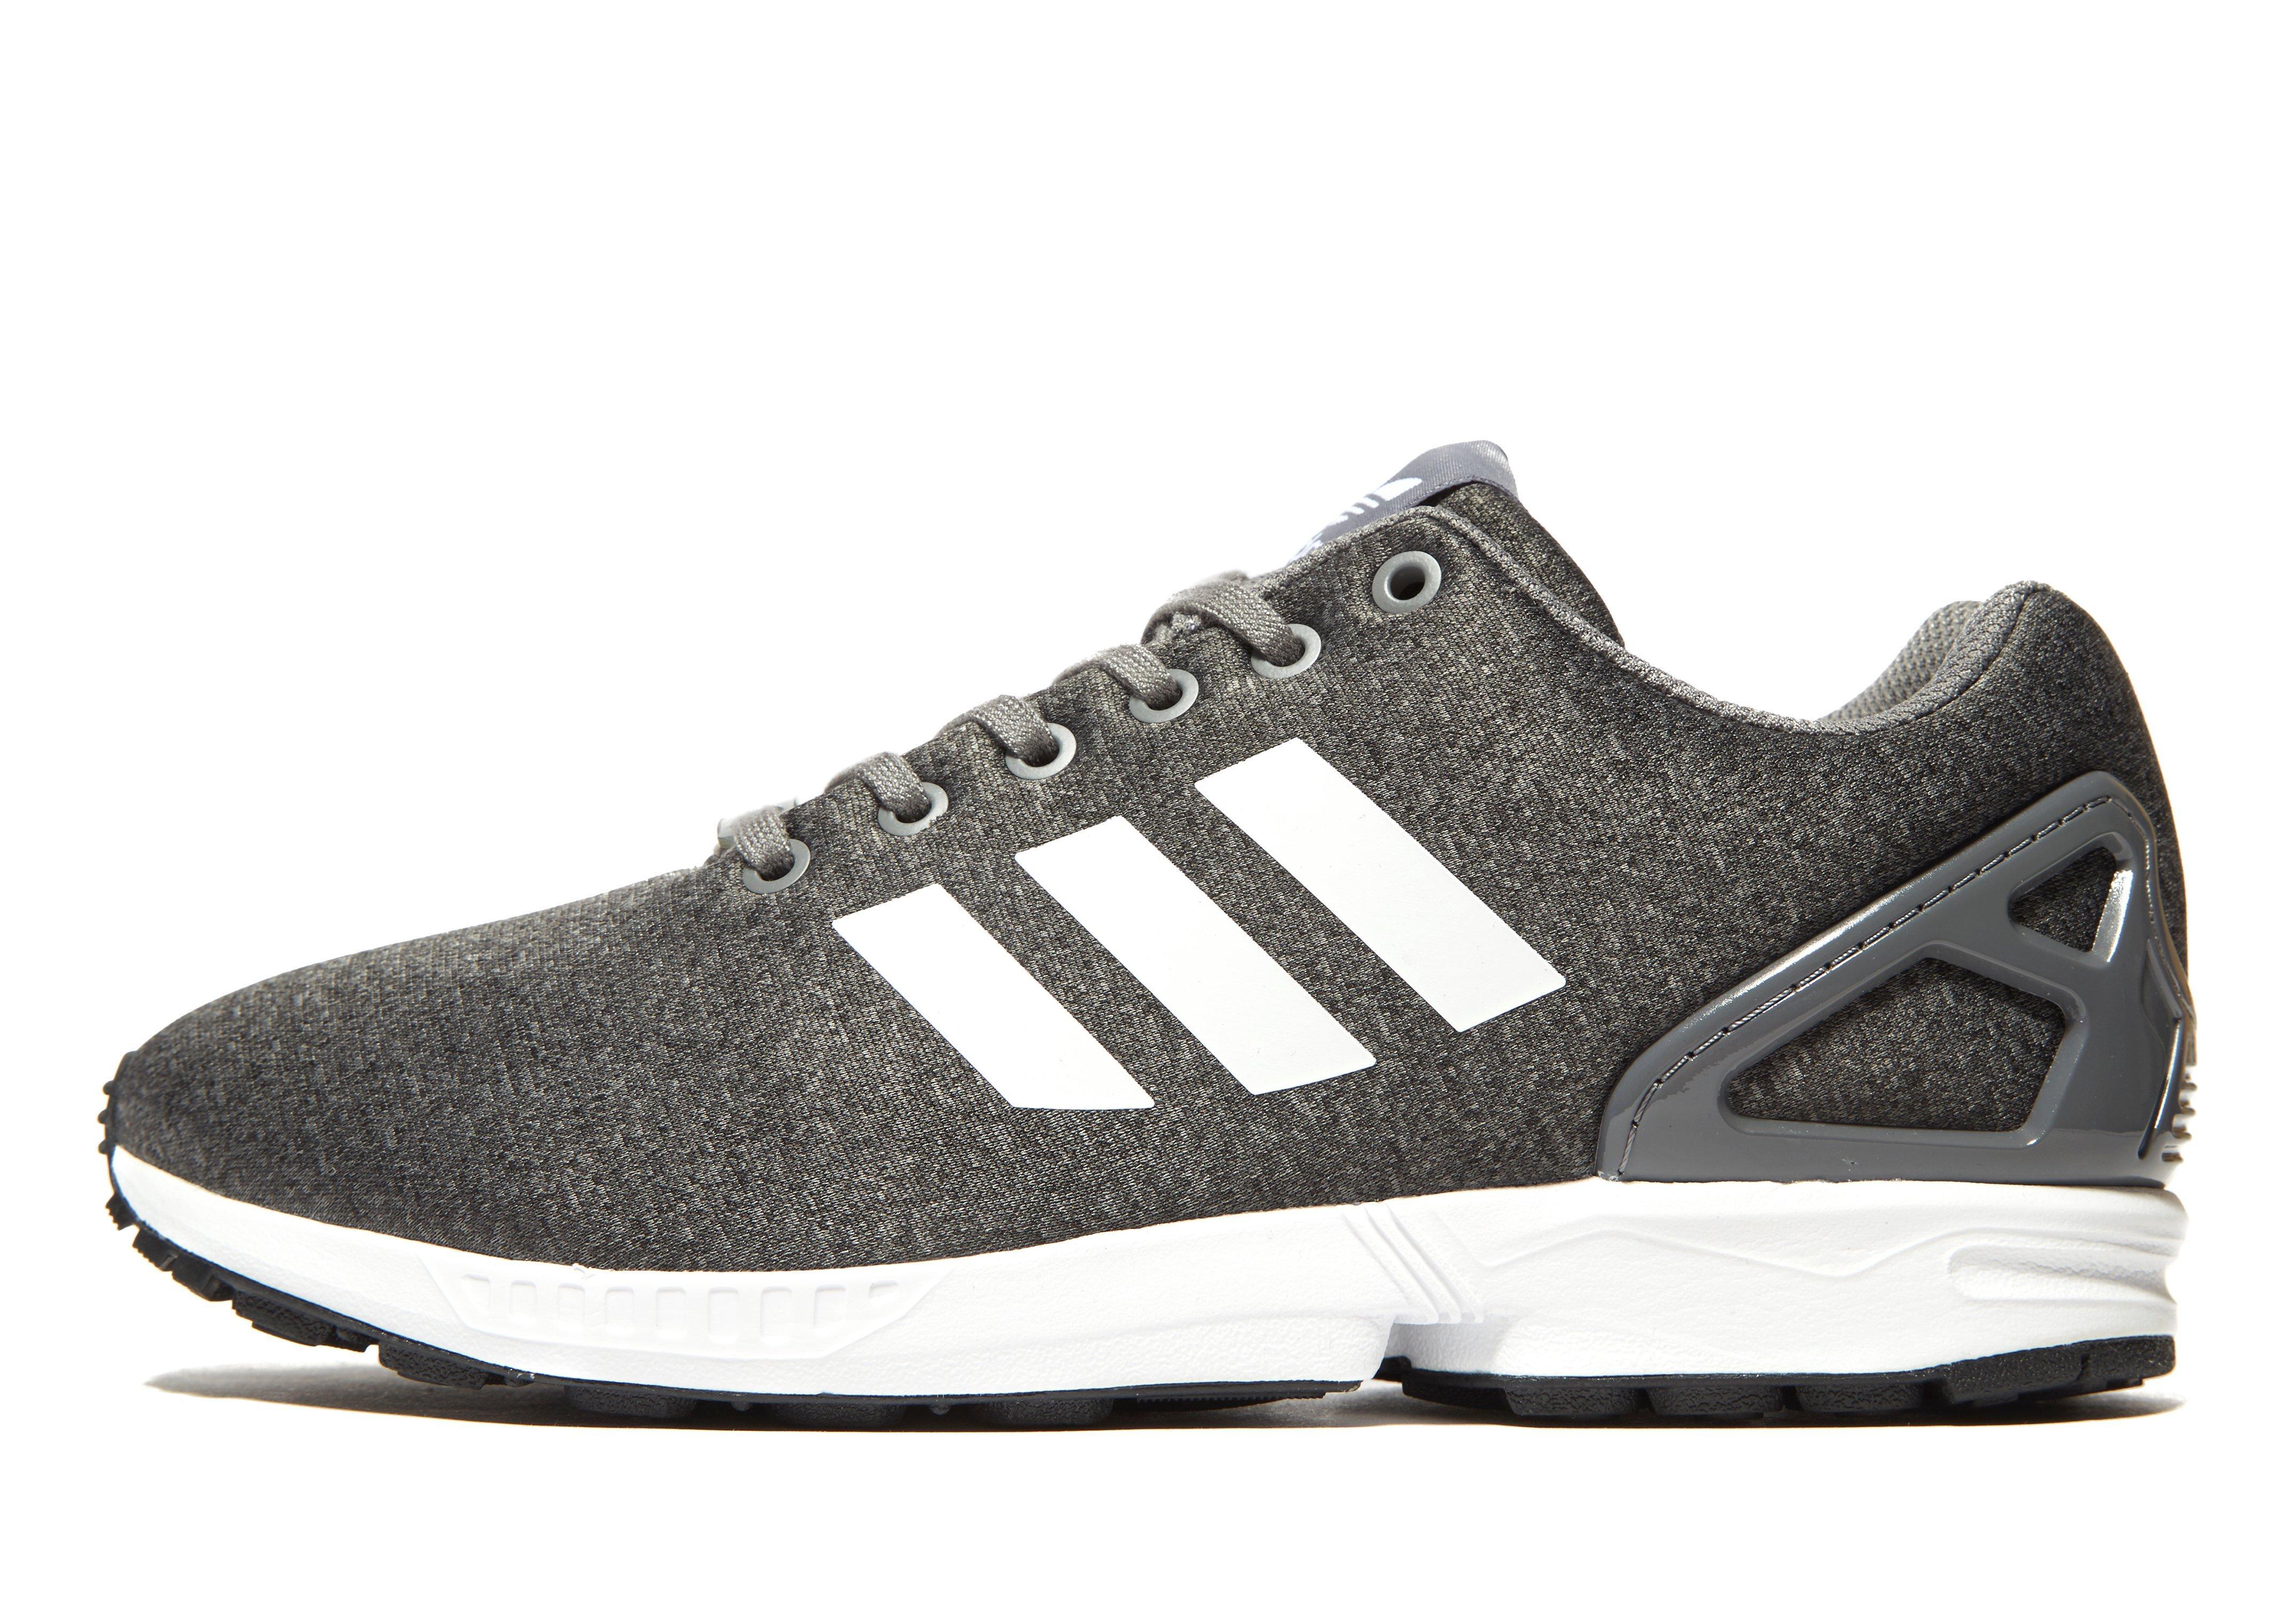 adidas Originals ZX Flux | JD Sports Ireland